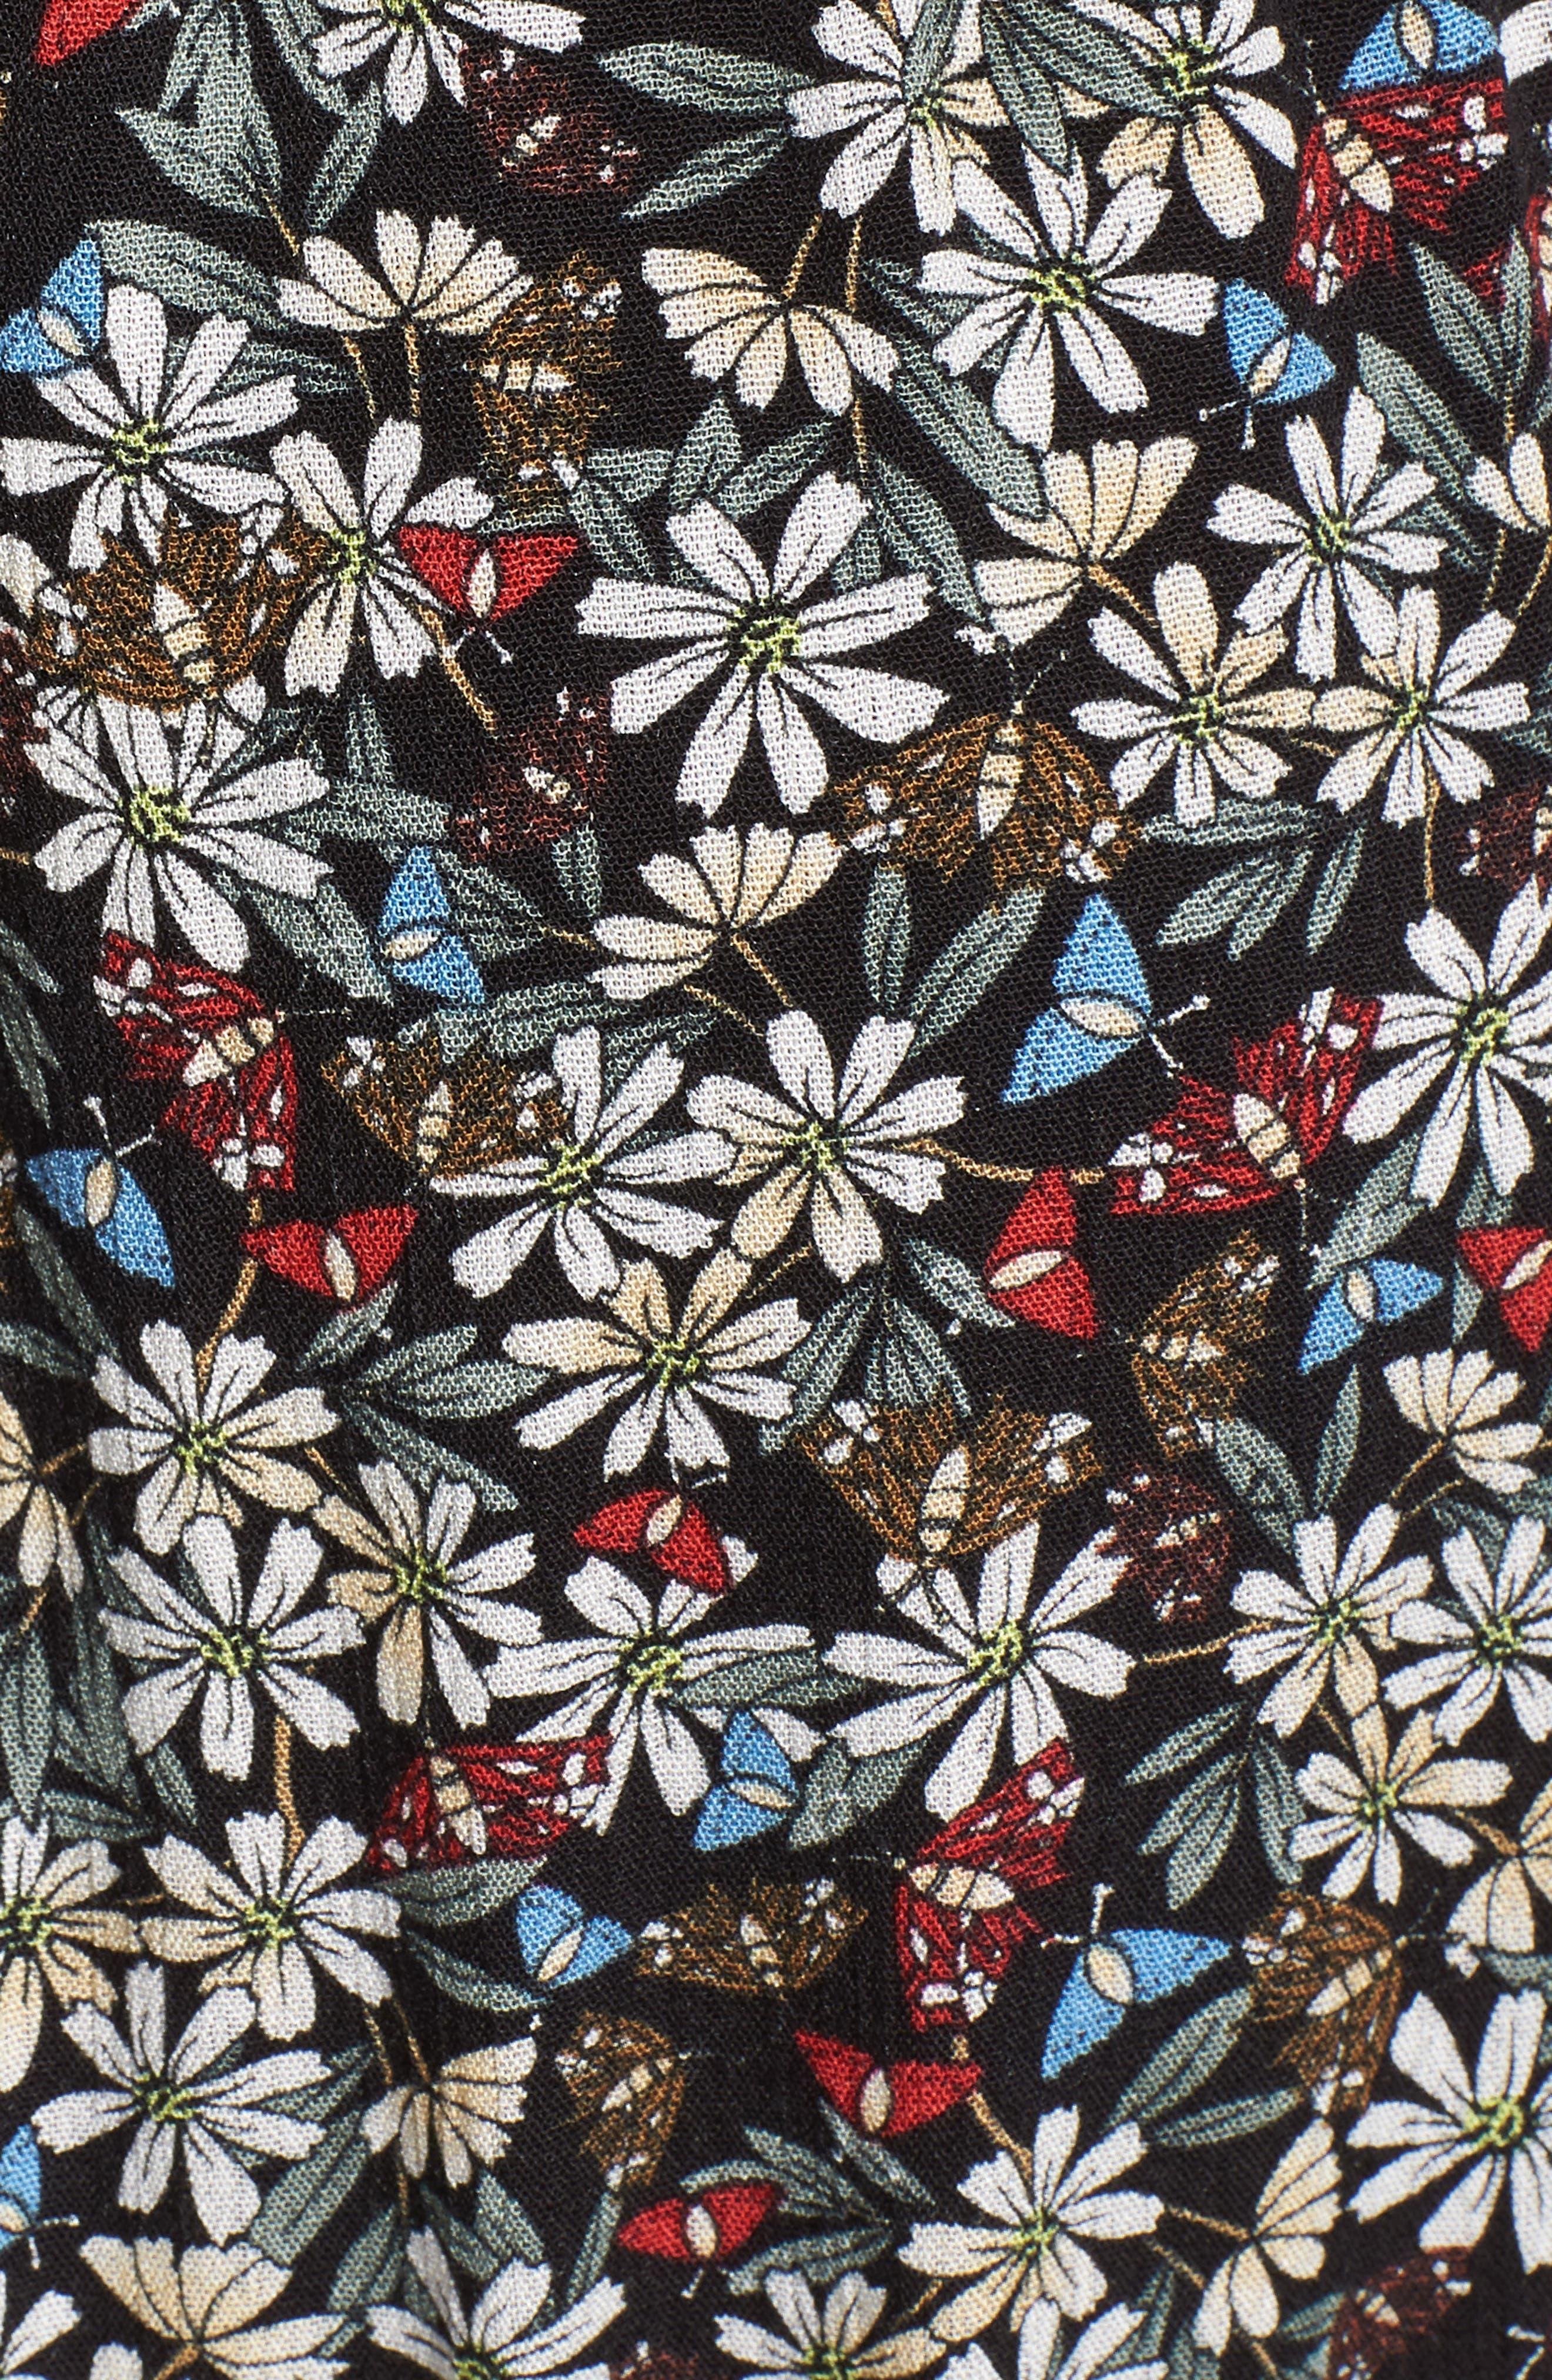 Flora Halter Neck Maxi Dress,                             Alternate thumbnail 6, color,                             Multi Black